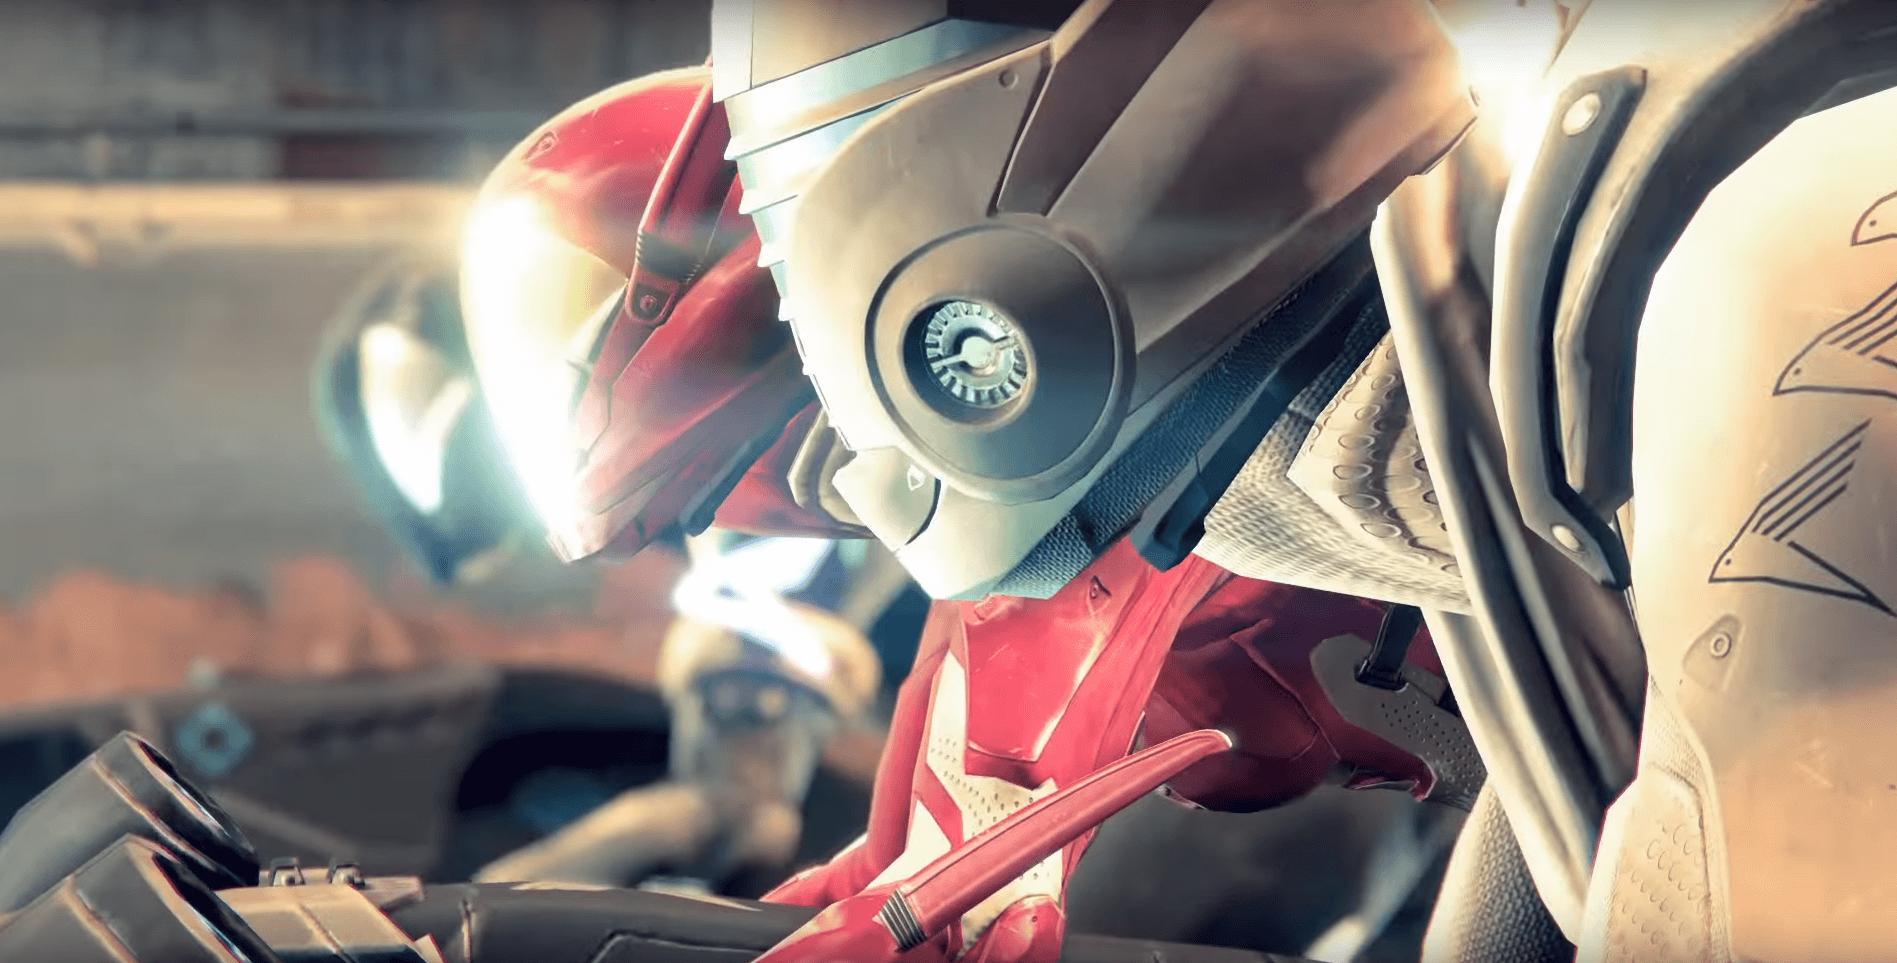 Destiny: Sparrow-Event endet ohne großes Feuerwerk